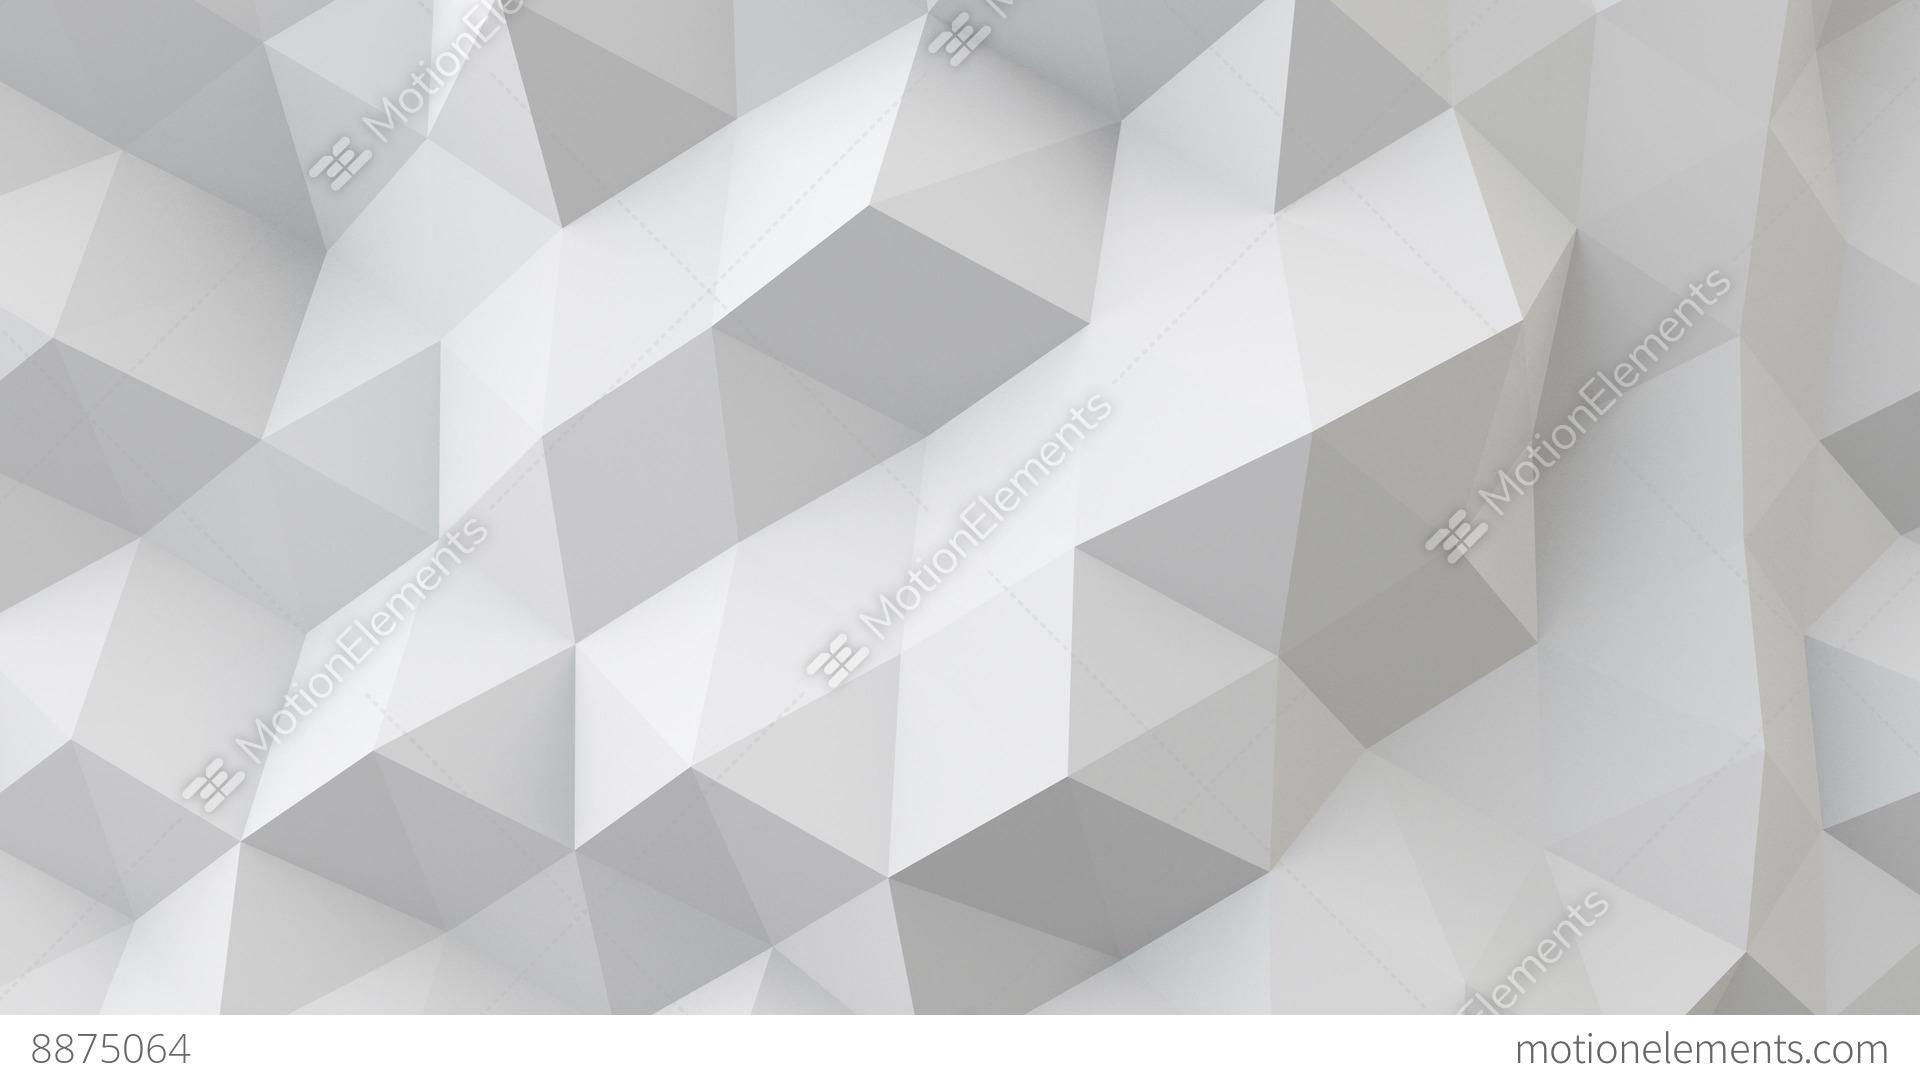 White Polygonal Geometric Surface Seamless Loop 4k UHD